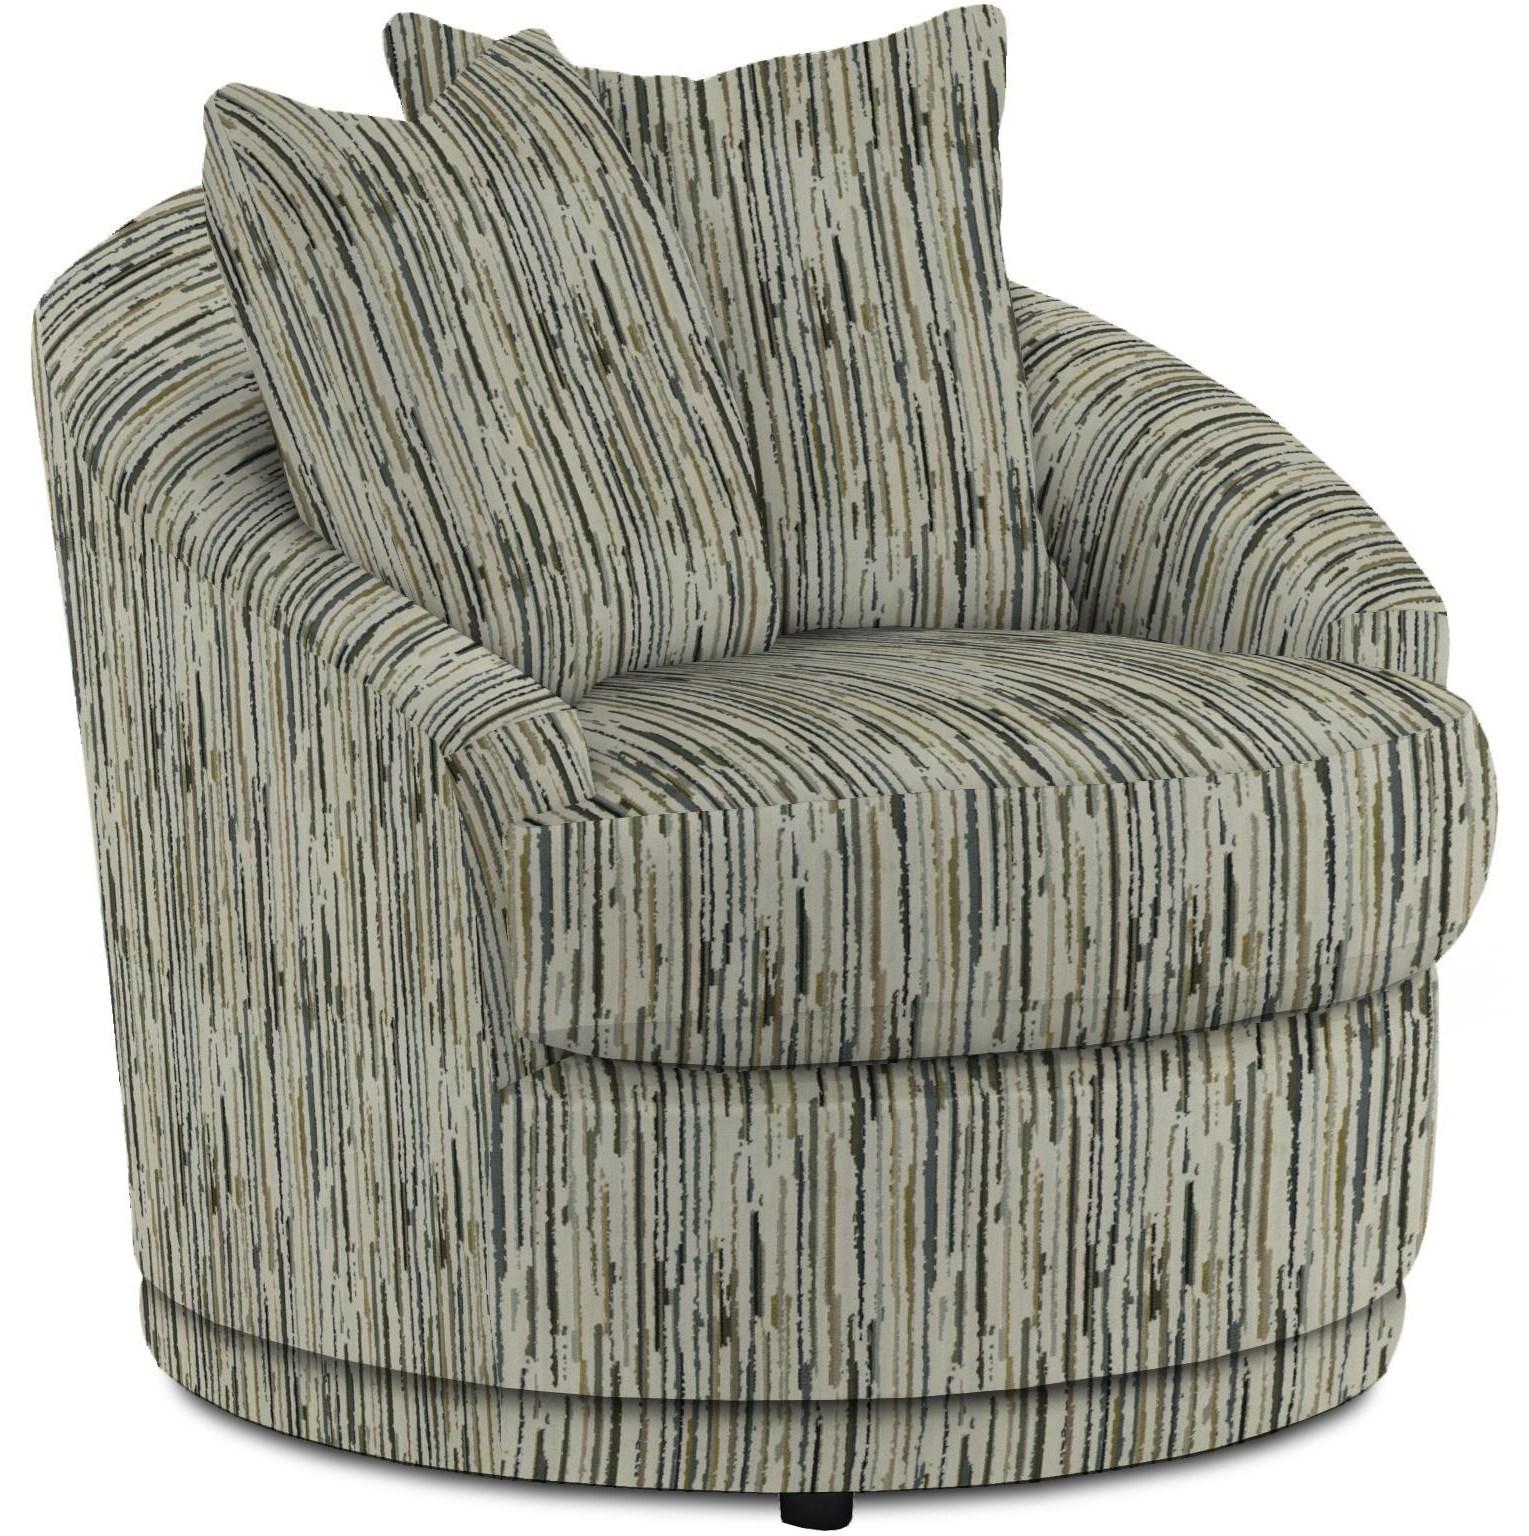 Alanna Swivel Barrel Chair by Bravo Furniture at Bennett's Furniture and Mattresses